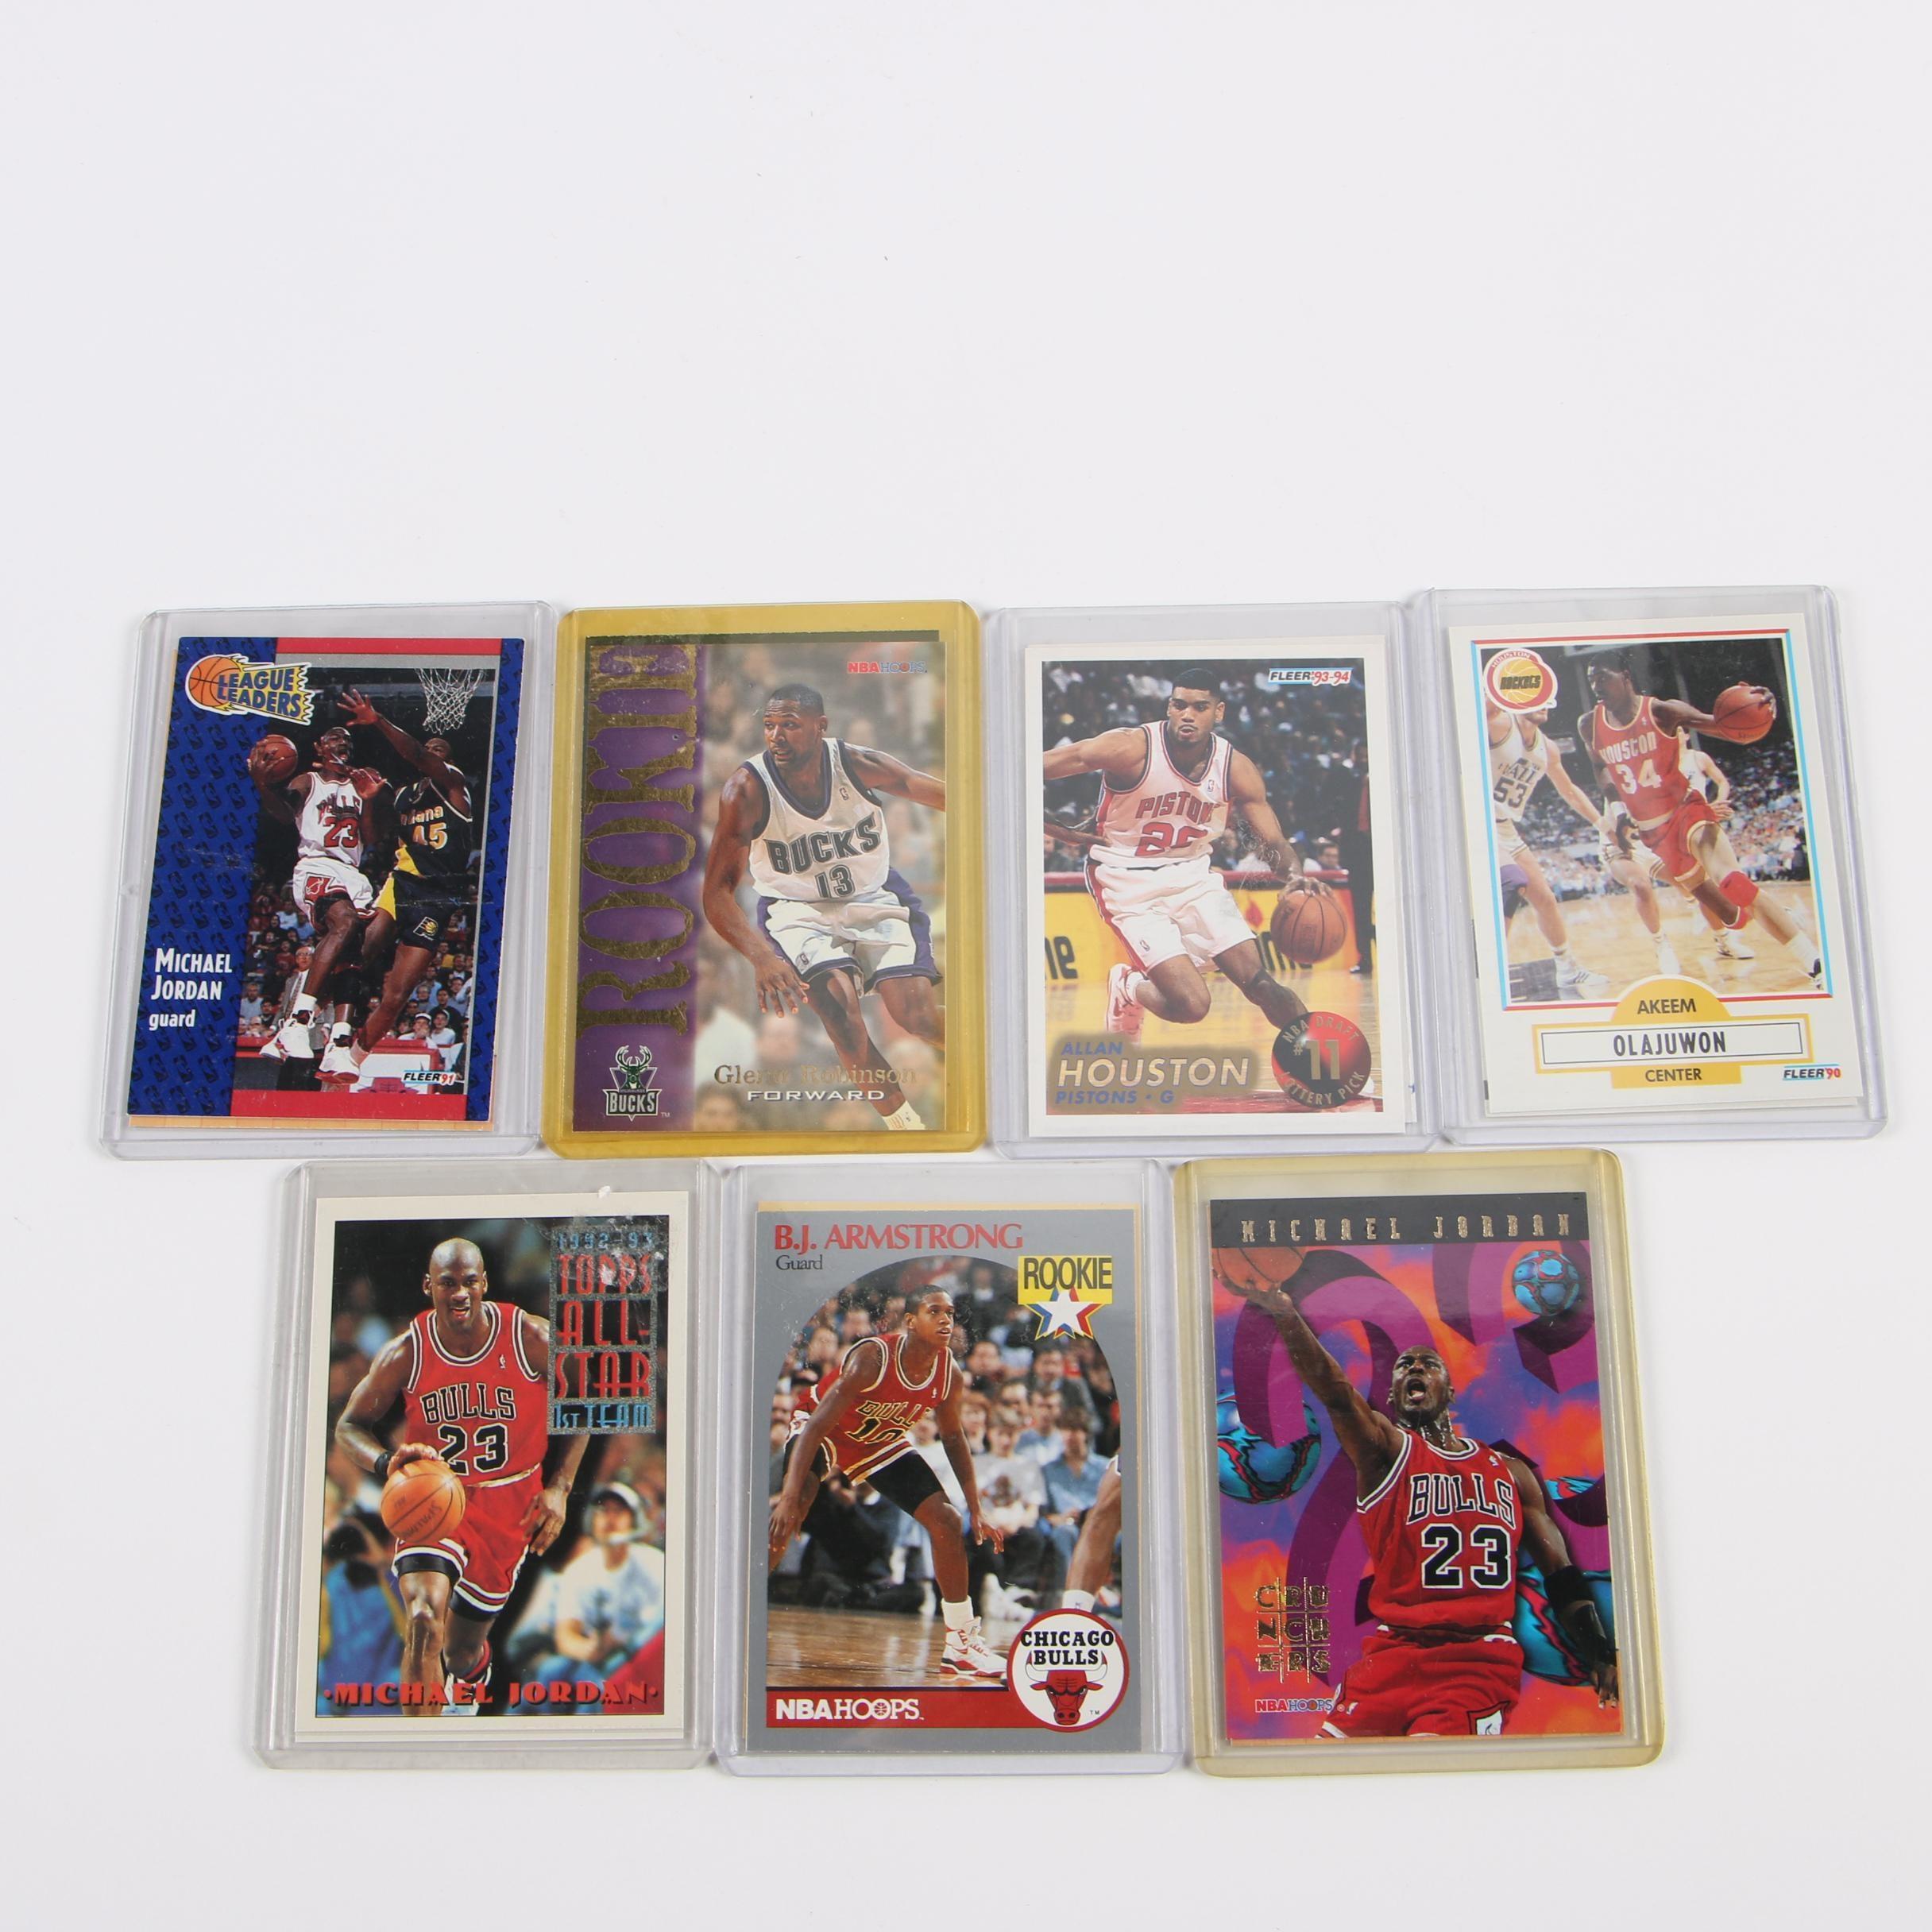 1990s Basketball Trading Cards including Michael Jordan